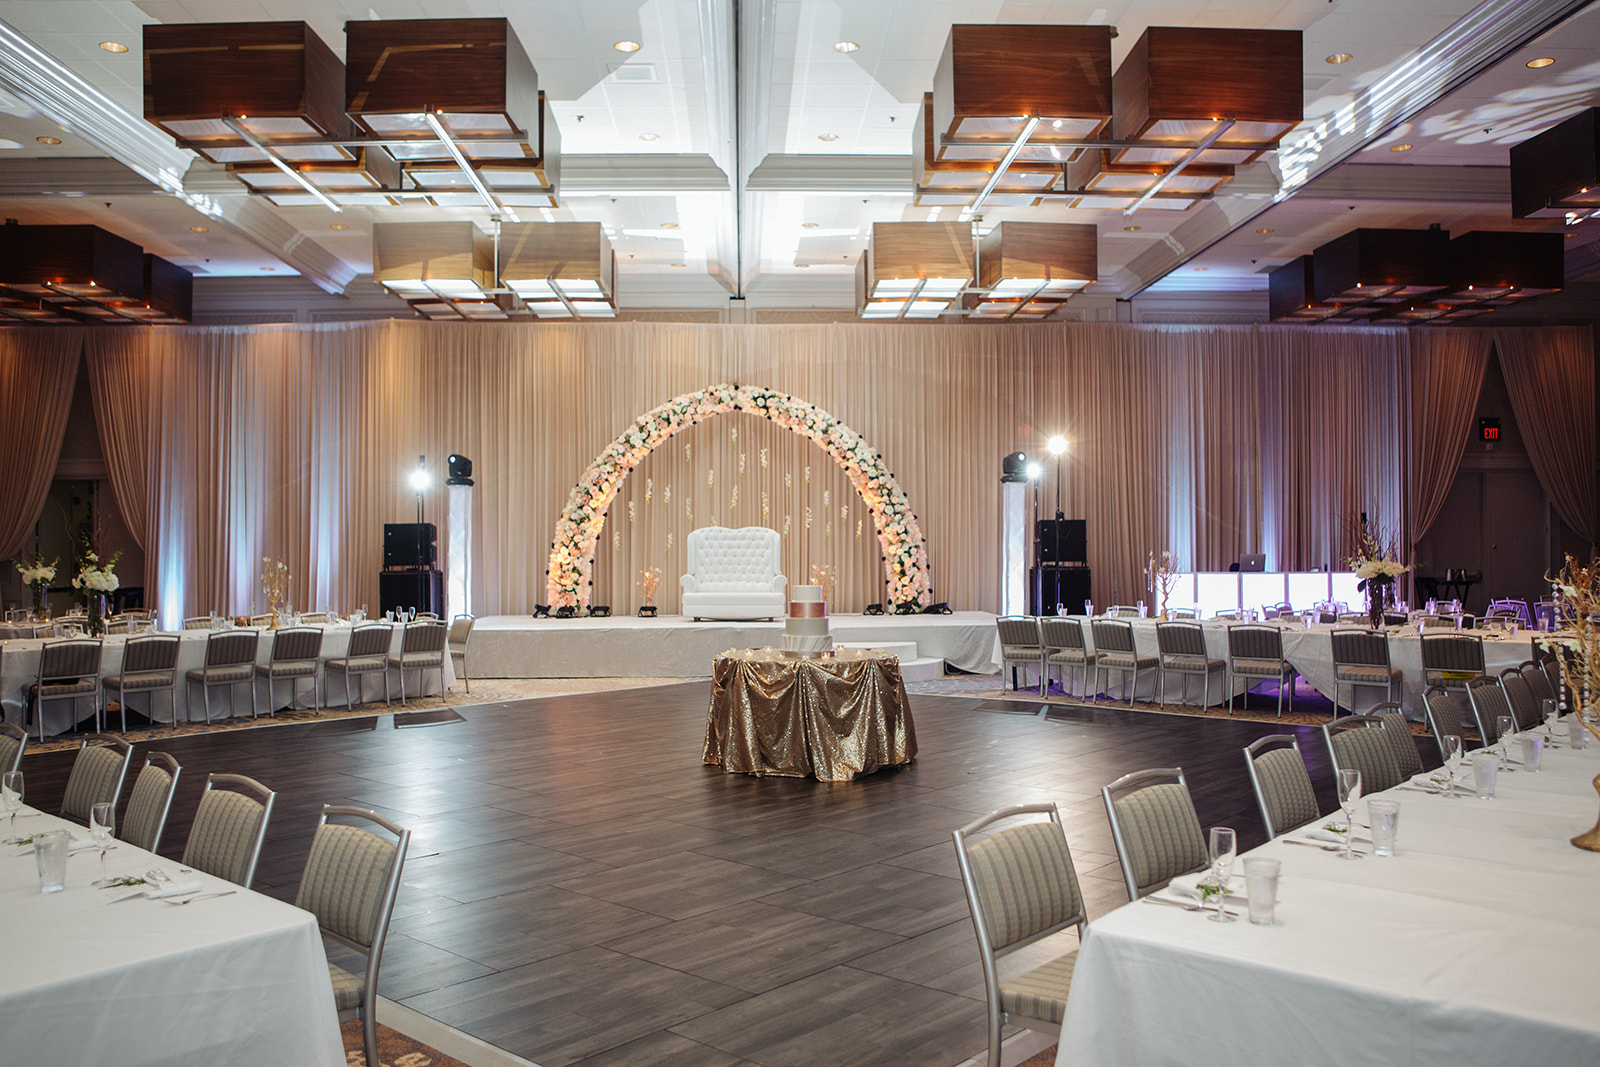 Le Cape Weddings - Reception Details - Rimi and Rohun -5.jpg